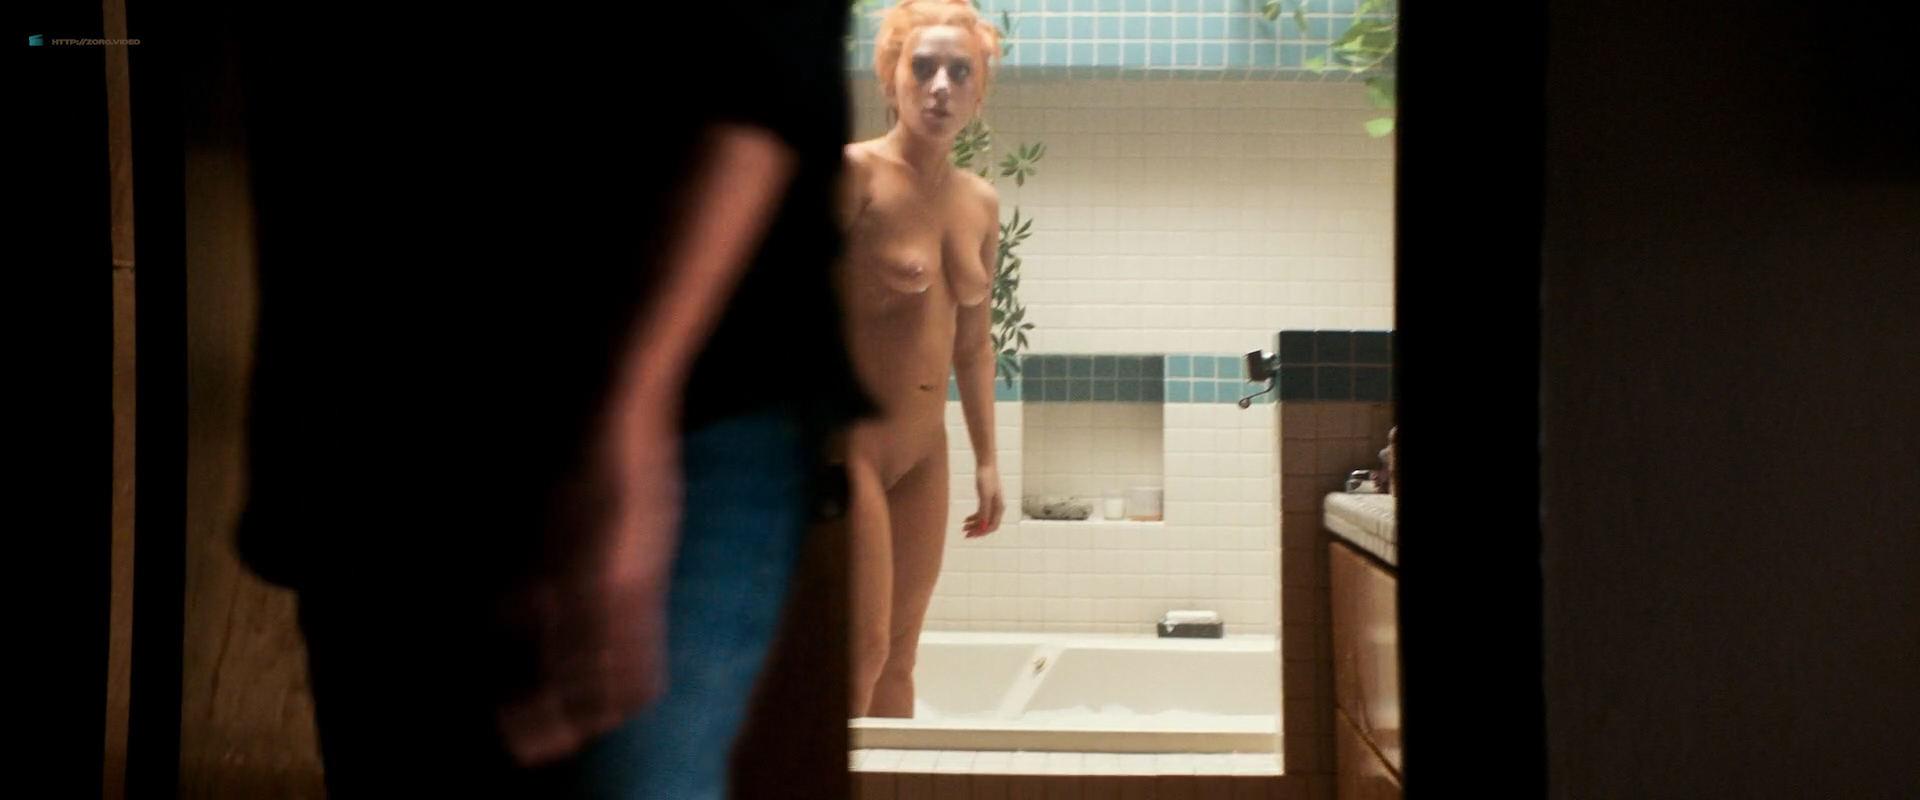 Akihiro sato nude photo